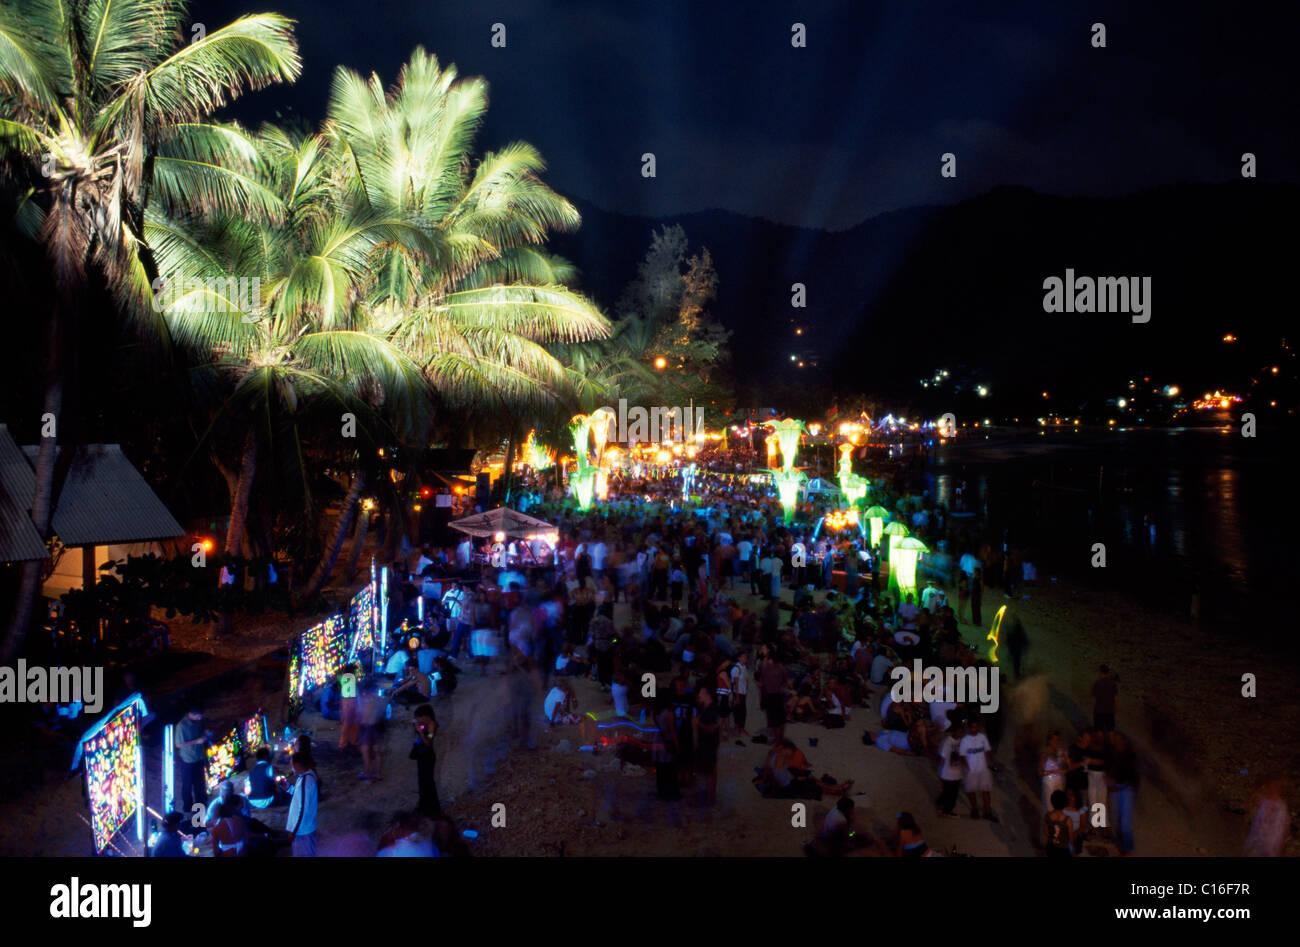 Dancing crowds at the Full Moon Party, Ko Phangan, Thailand, Asia - Stock Image